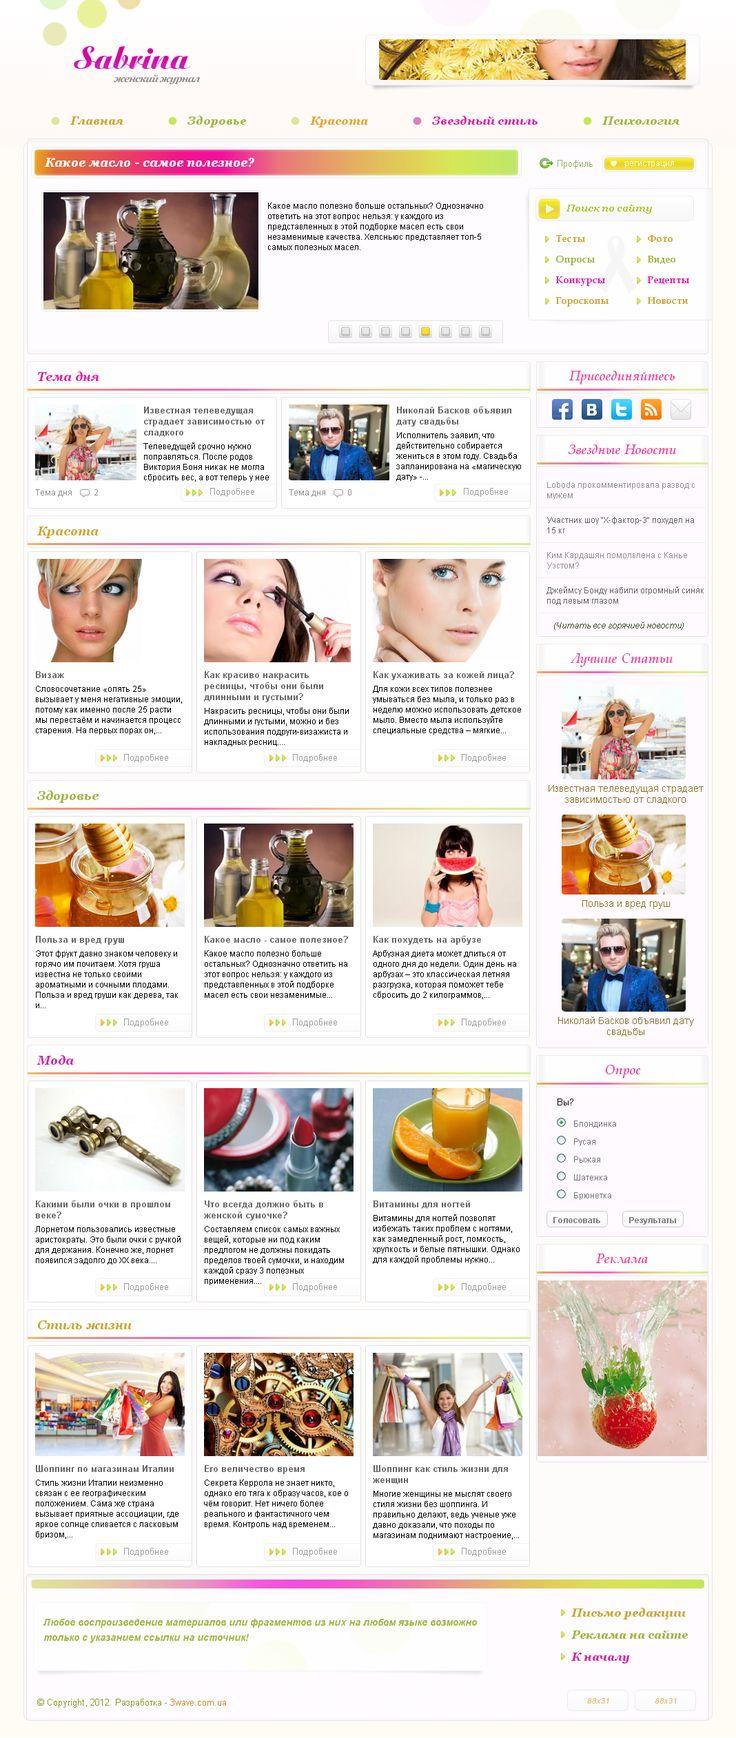 Sabrina - женский шаблон DLE для создания женского журнала #templates #website #шаблон #сайт #web